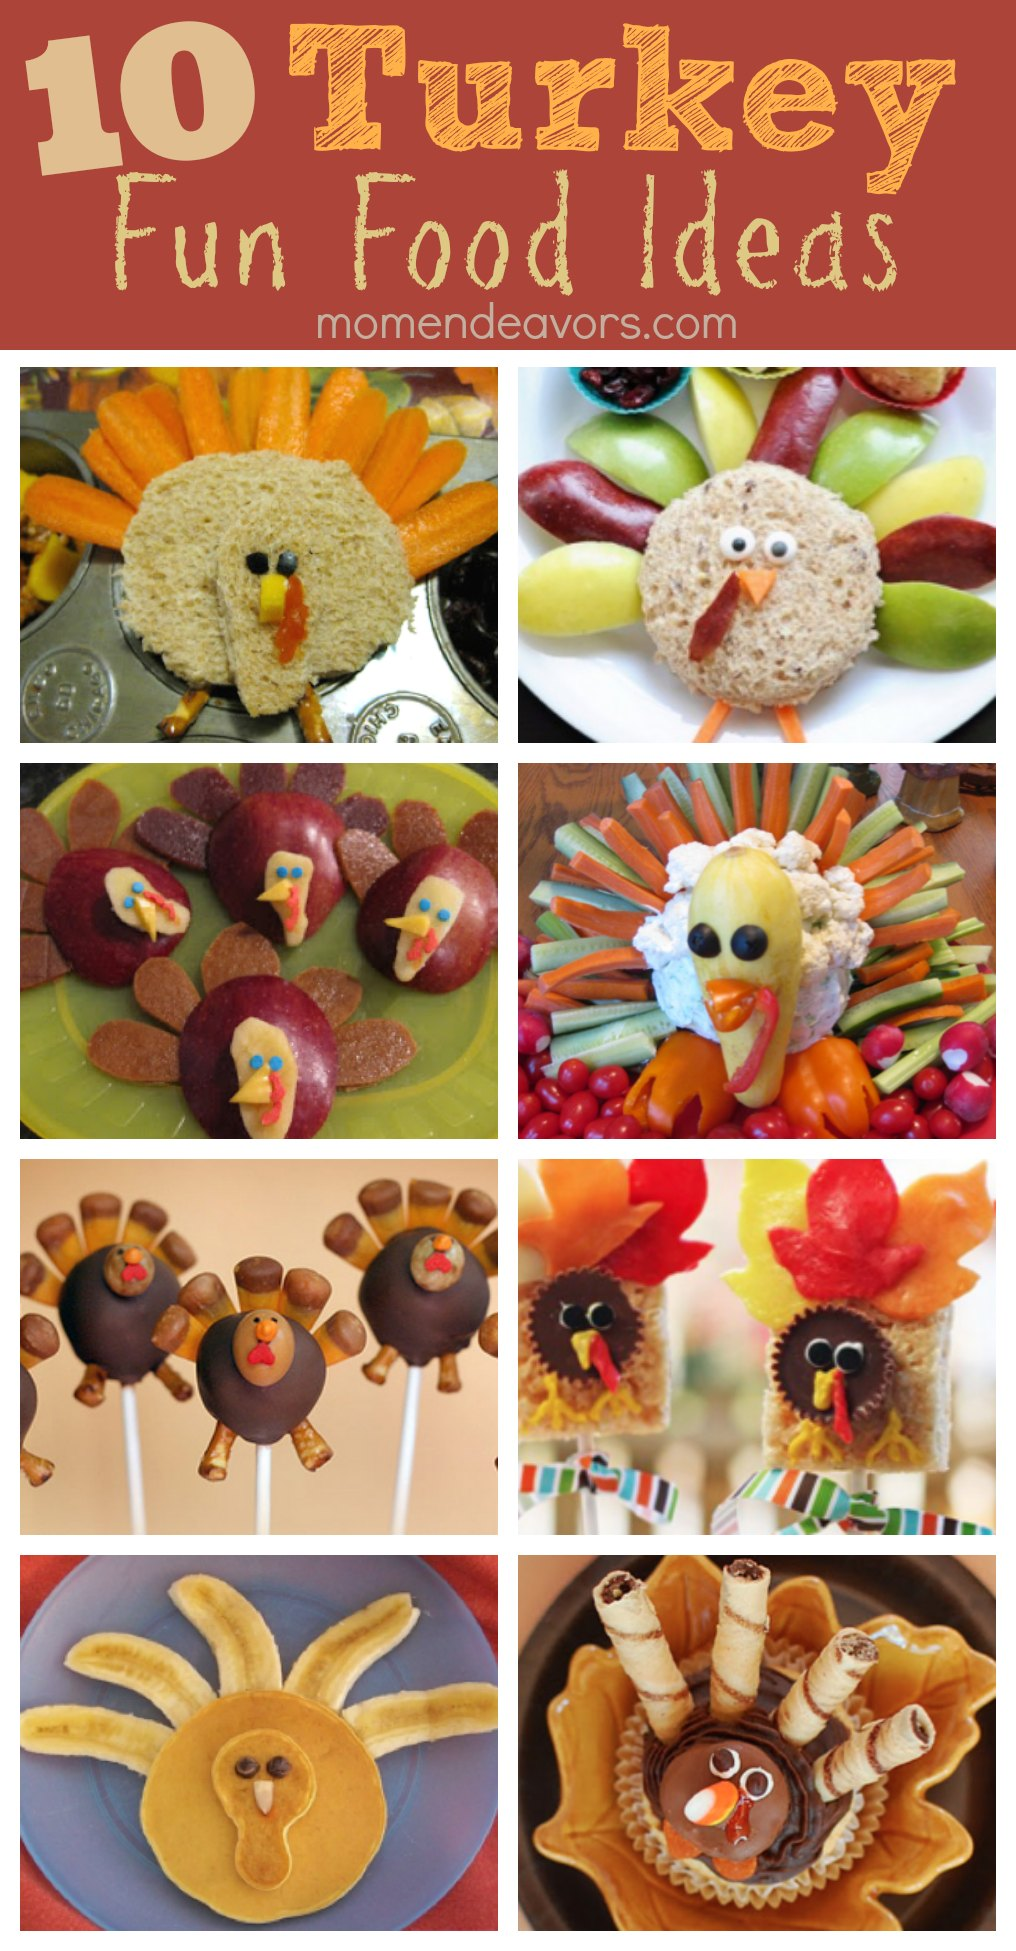 10 Turkey Fun Food Ideas